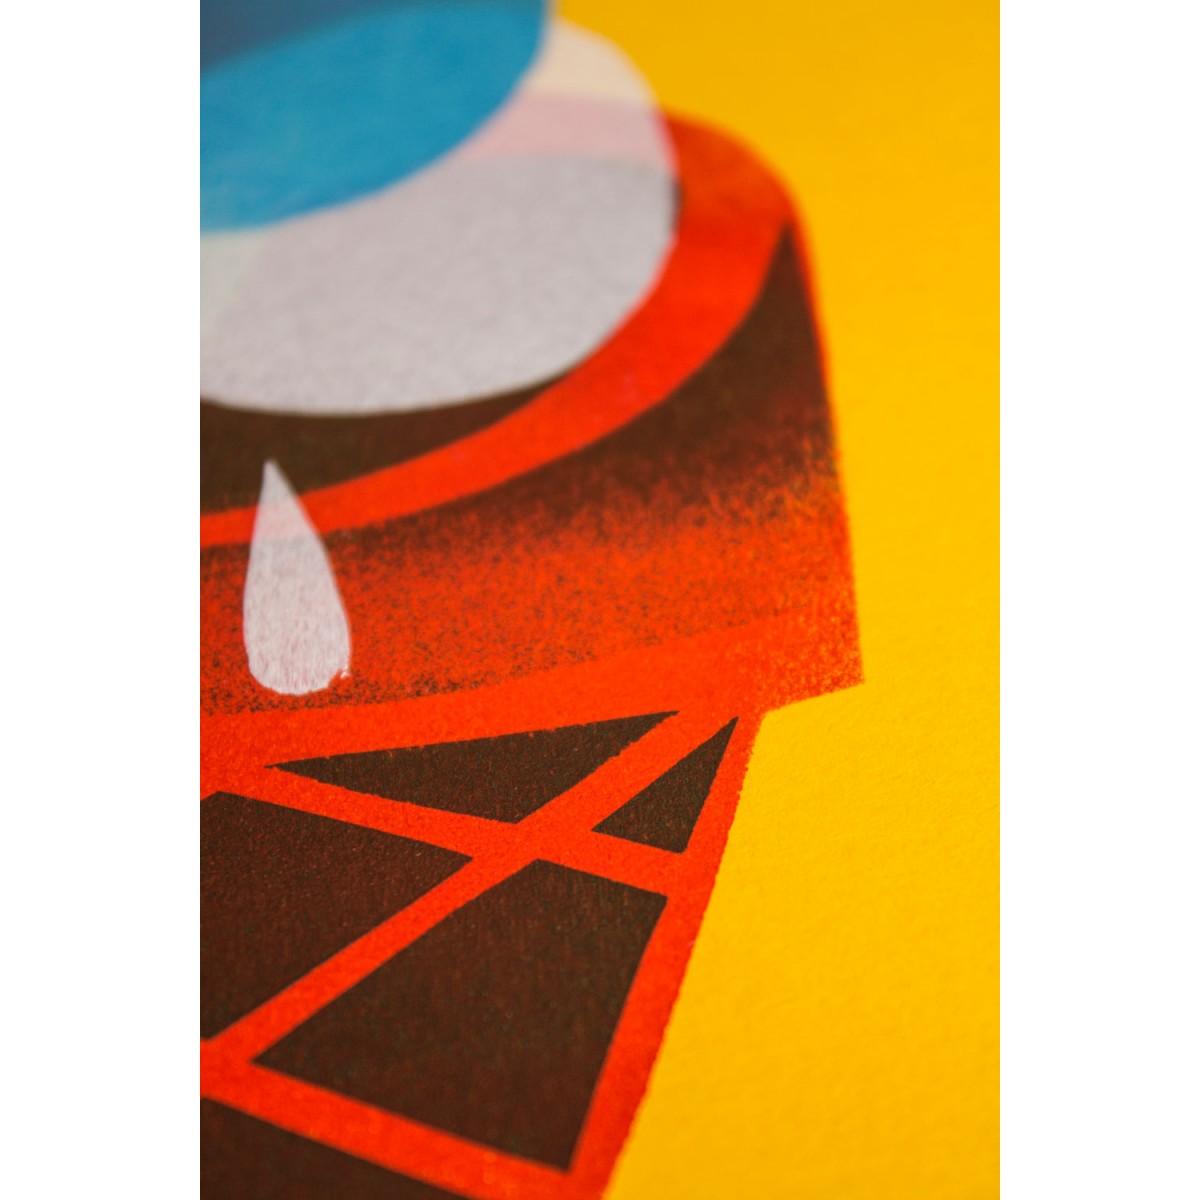 Stencil Artprint »Gelato« DINA4